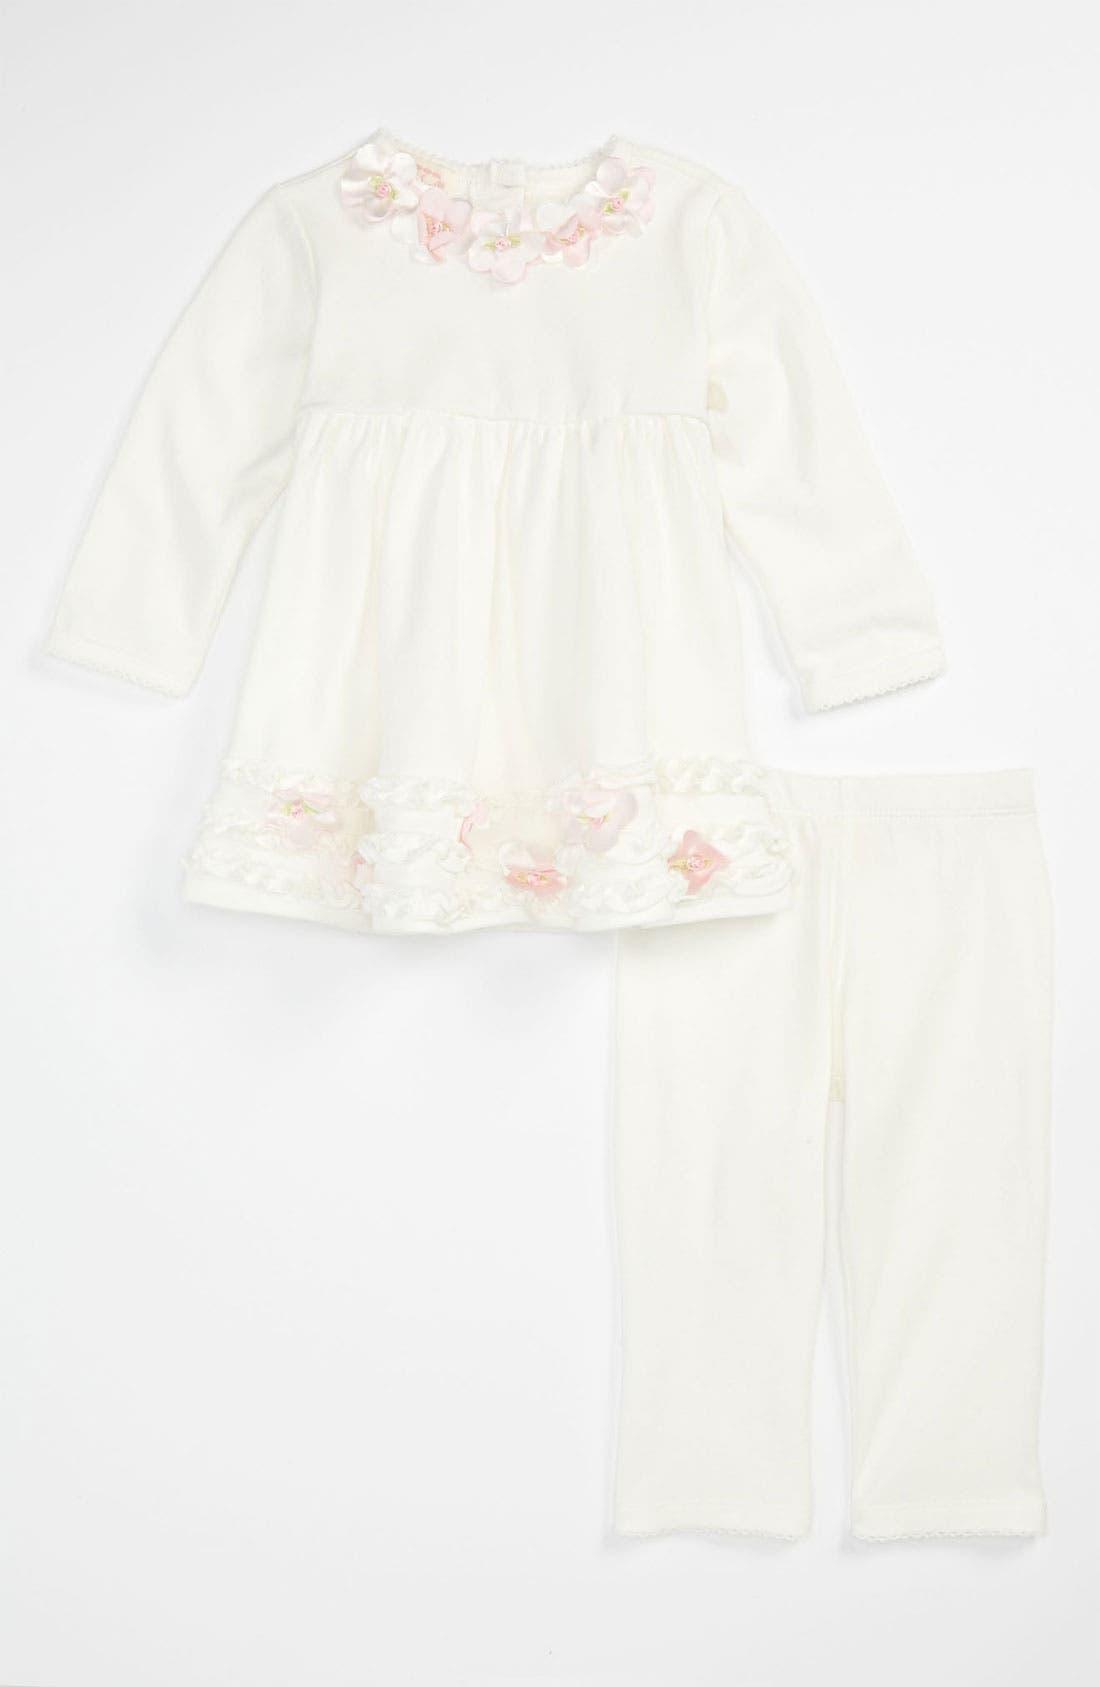 Alternate Image 1 Selected - Biscotti Dress & Leggings (Infant)